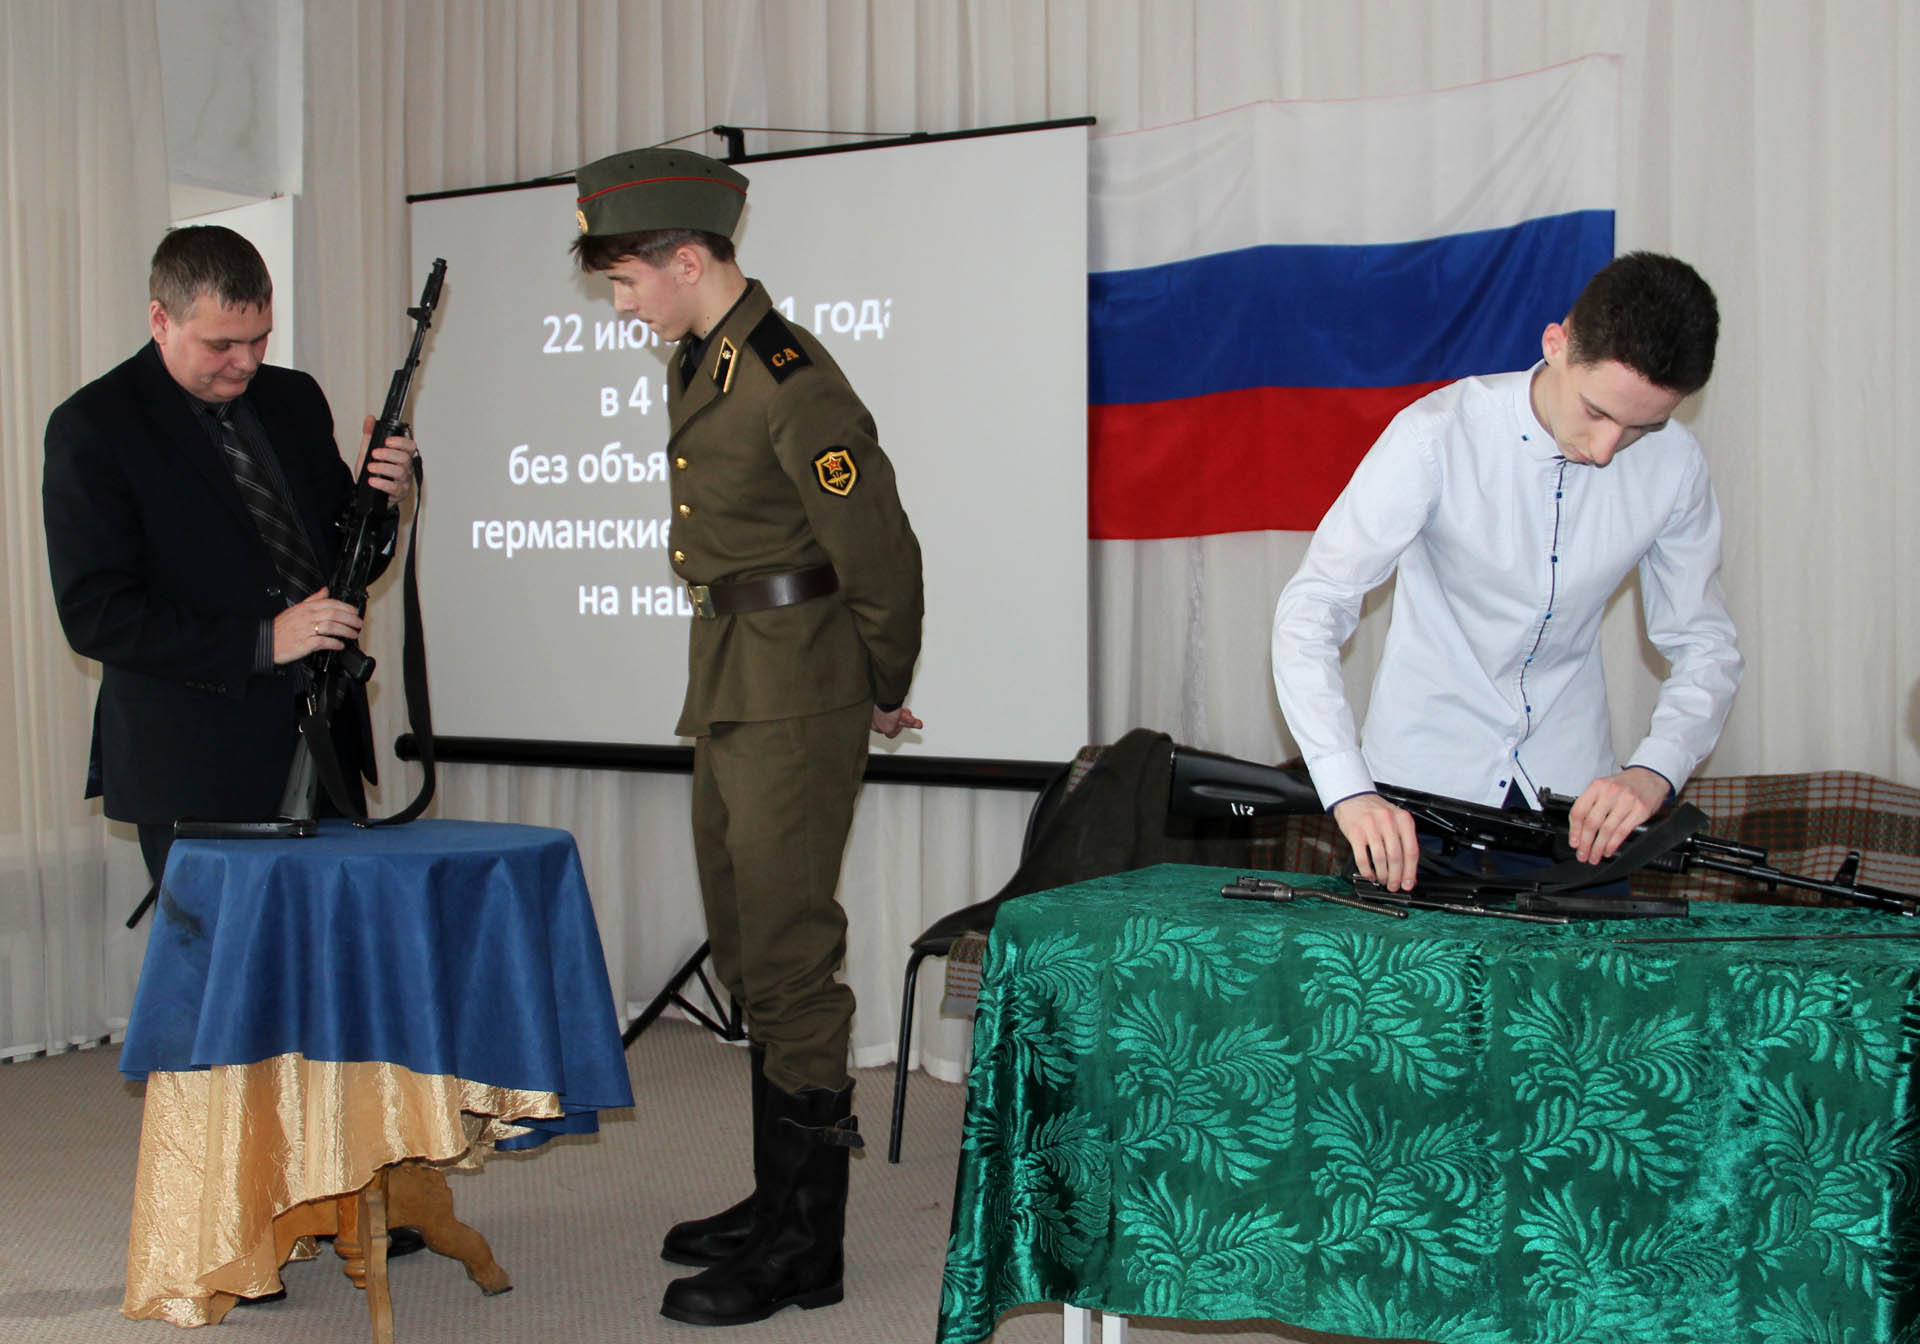 Д. Кочеврягин провел мастер-класс по сборке автомата